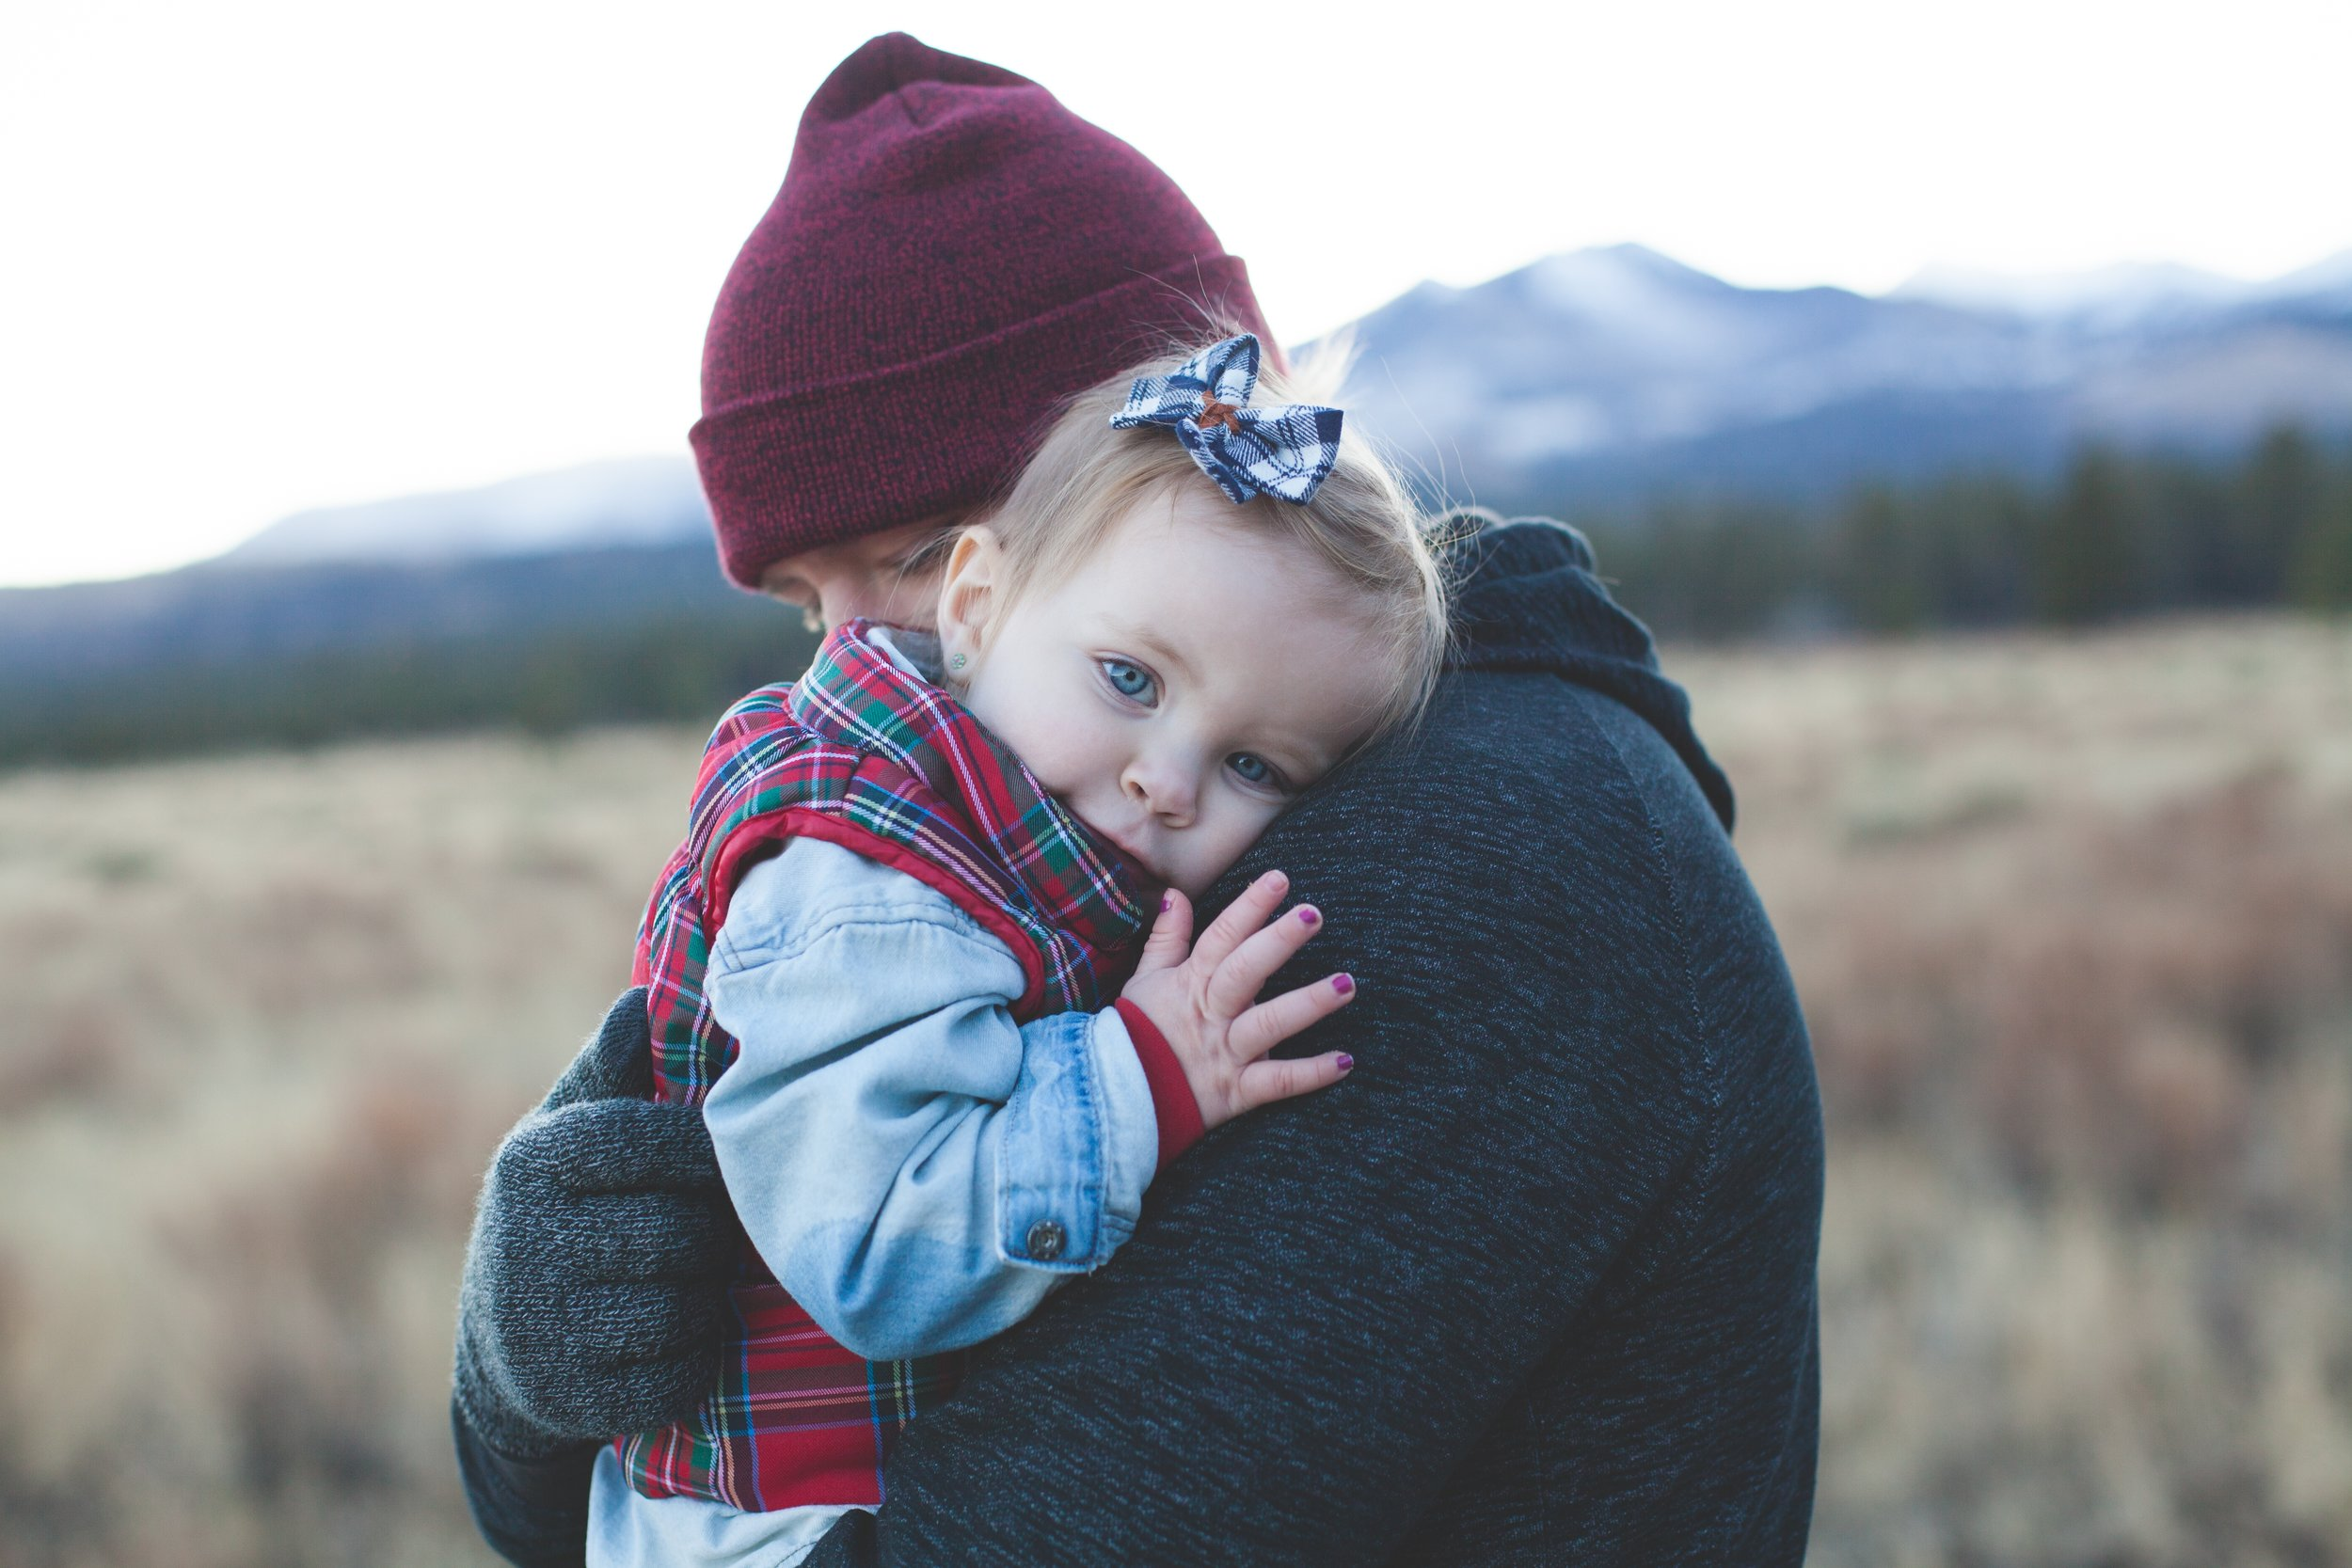 negative-space-family-baby-child-man-cold-hike-josh-willink.jpg